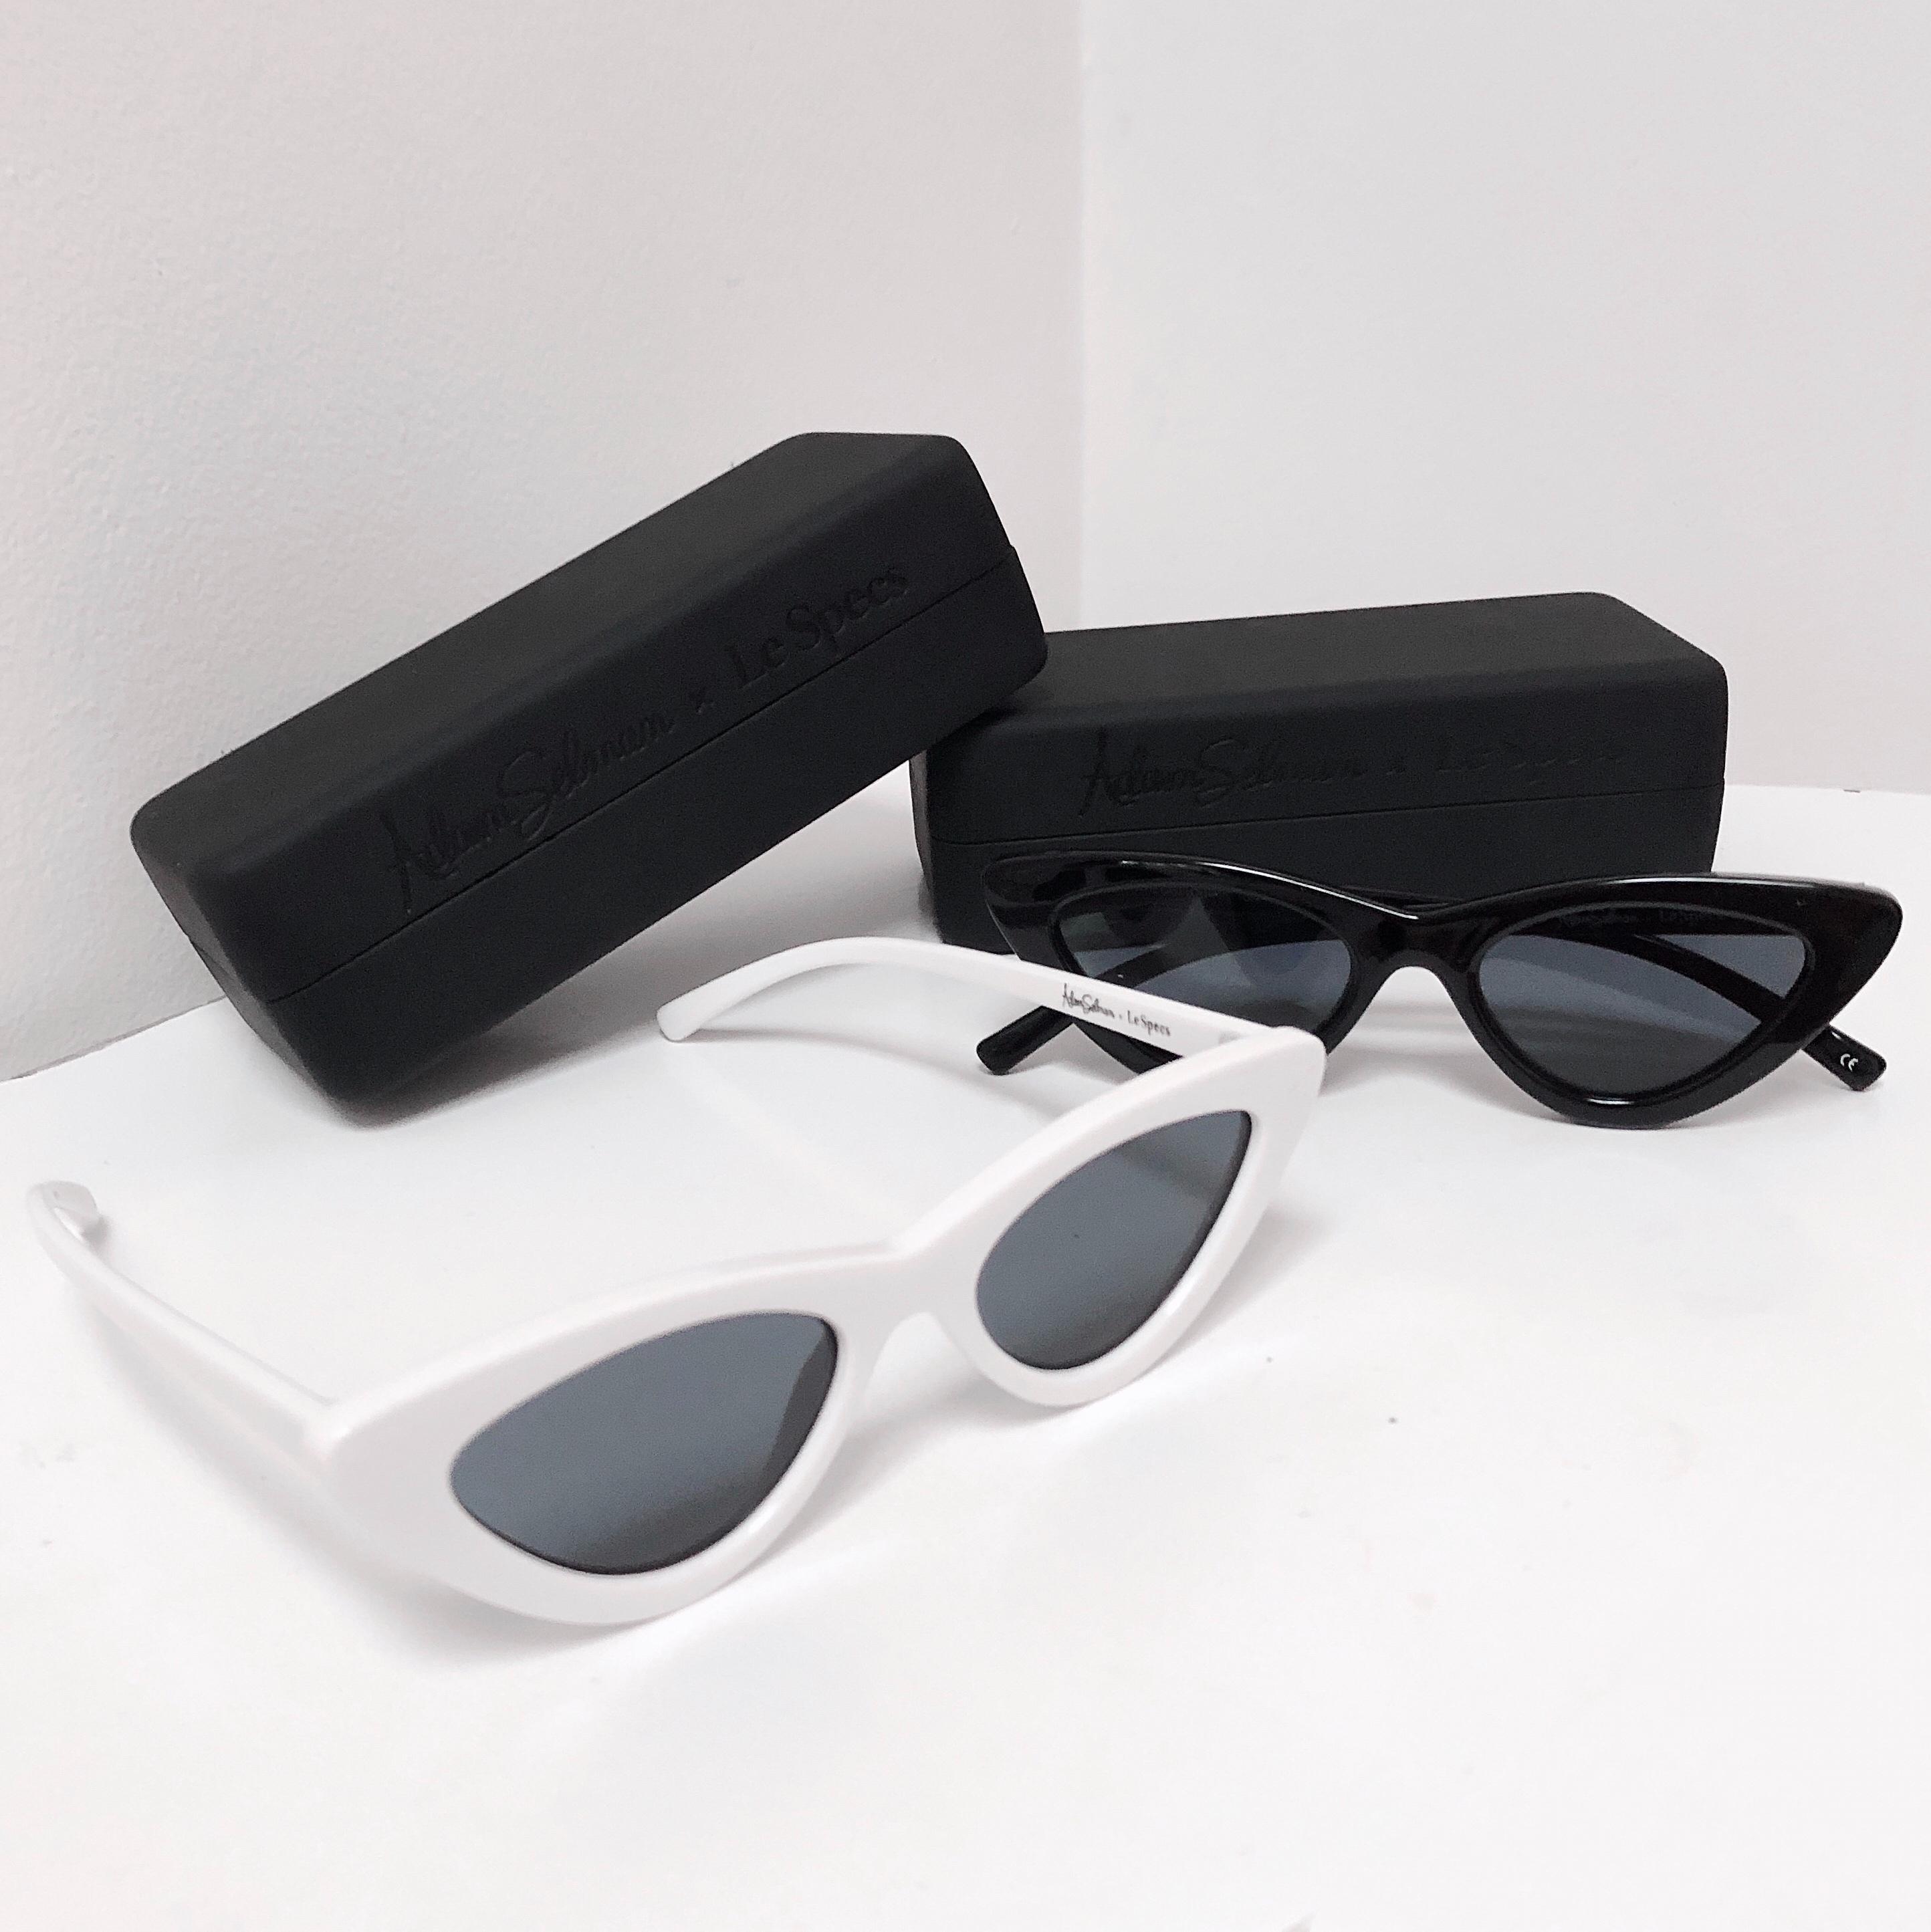 Le Specs - Adam Selman - Fashion - Black and White - Cat-Eye Sunglasses